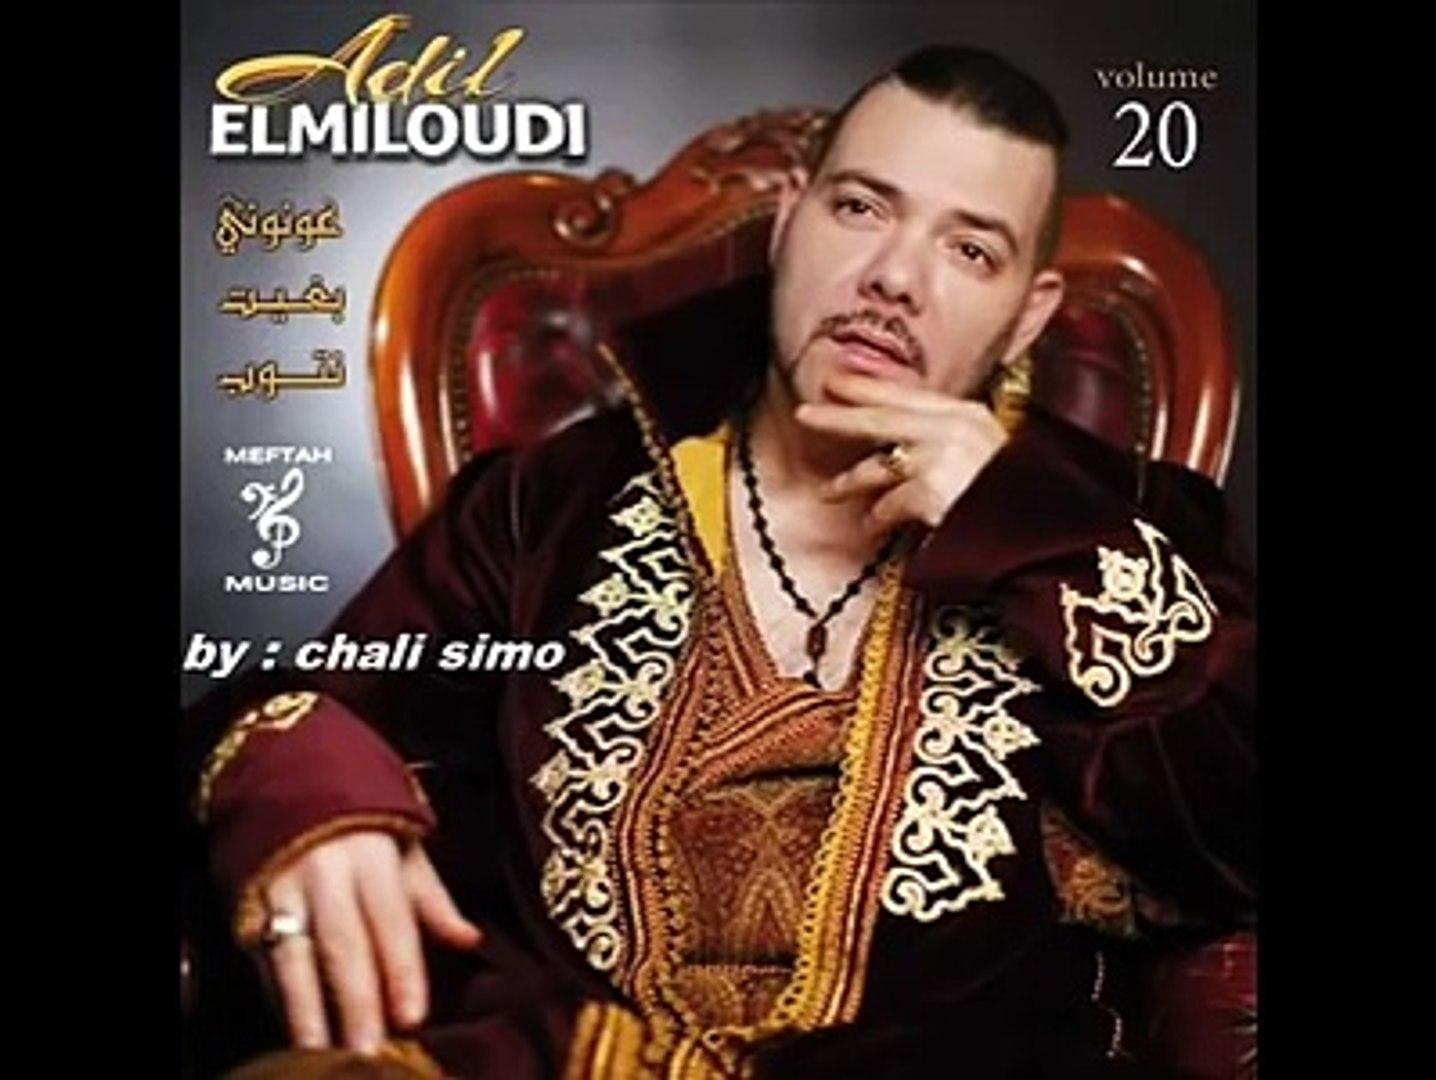 Adil El Miloudi - El Ghorba - 2015 - جديد عادل الميلودي - الغربة